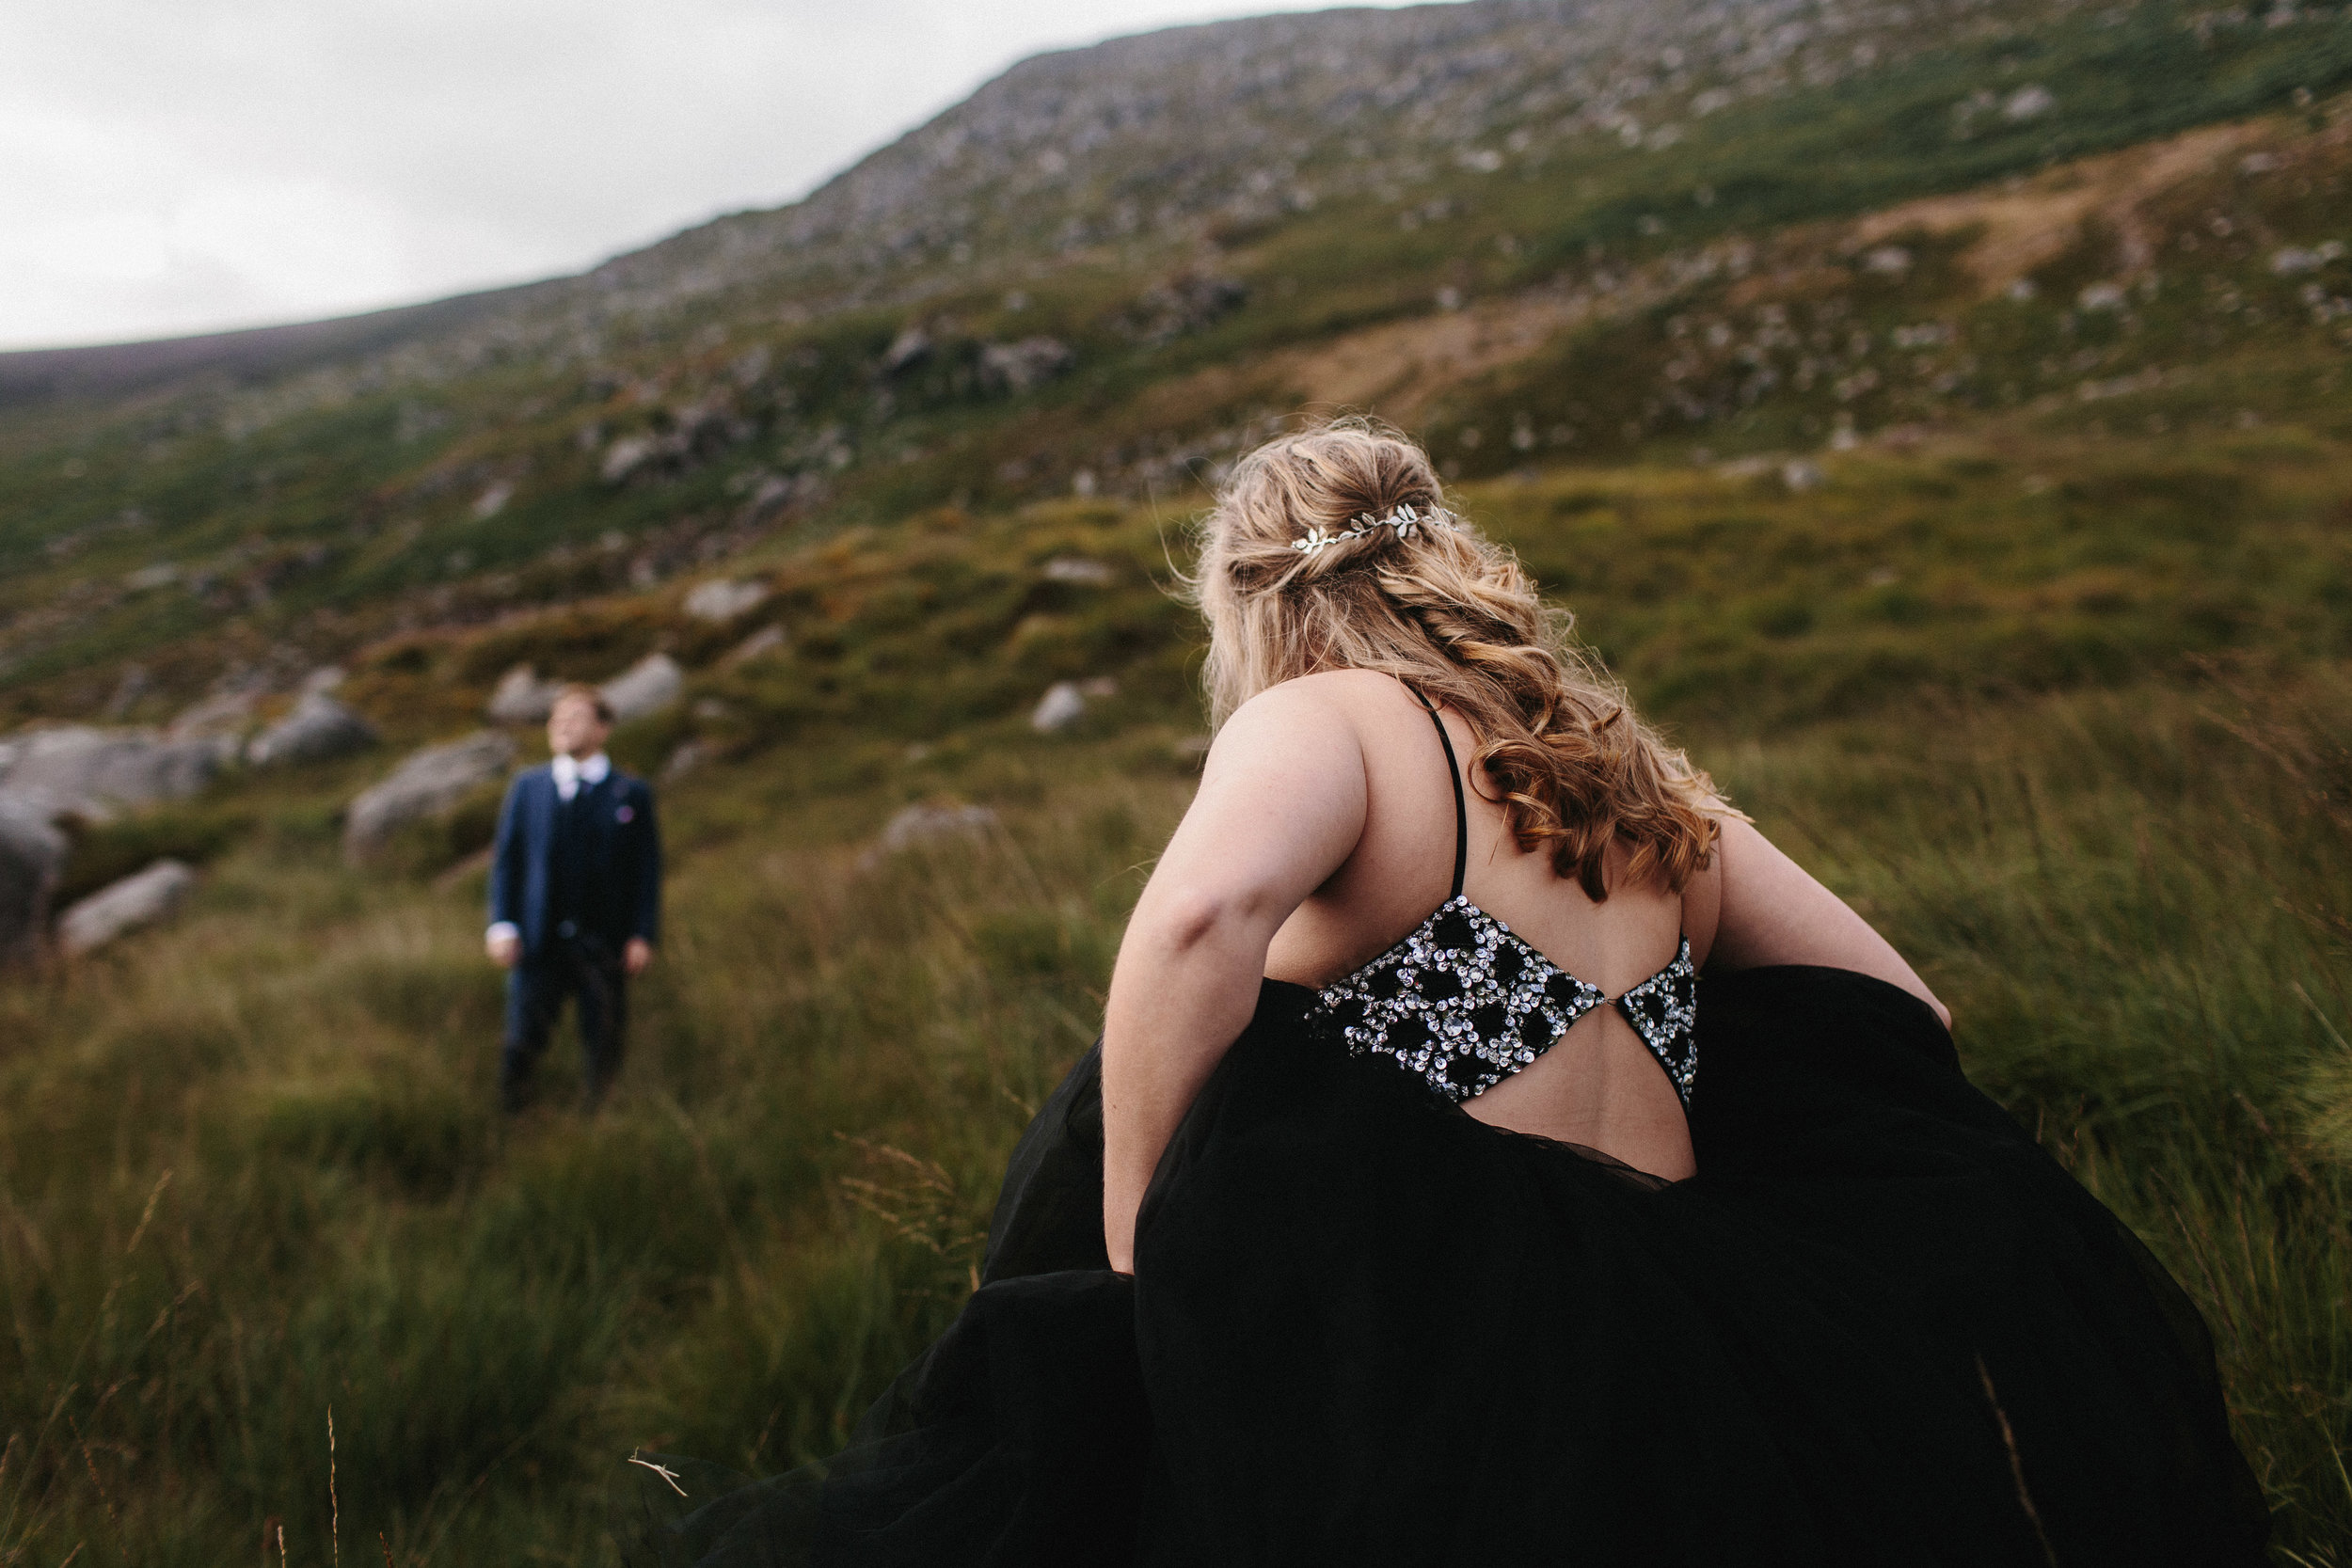 ireland_elopement_black_wedding_dress_wicklow_glendalough_athy_st_kevins_way_1153.jpg